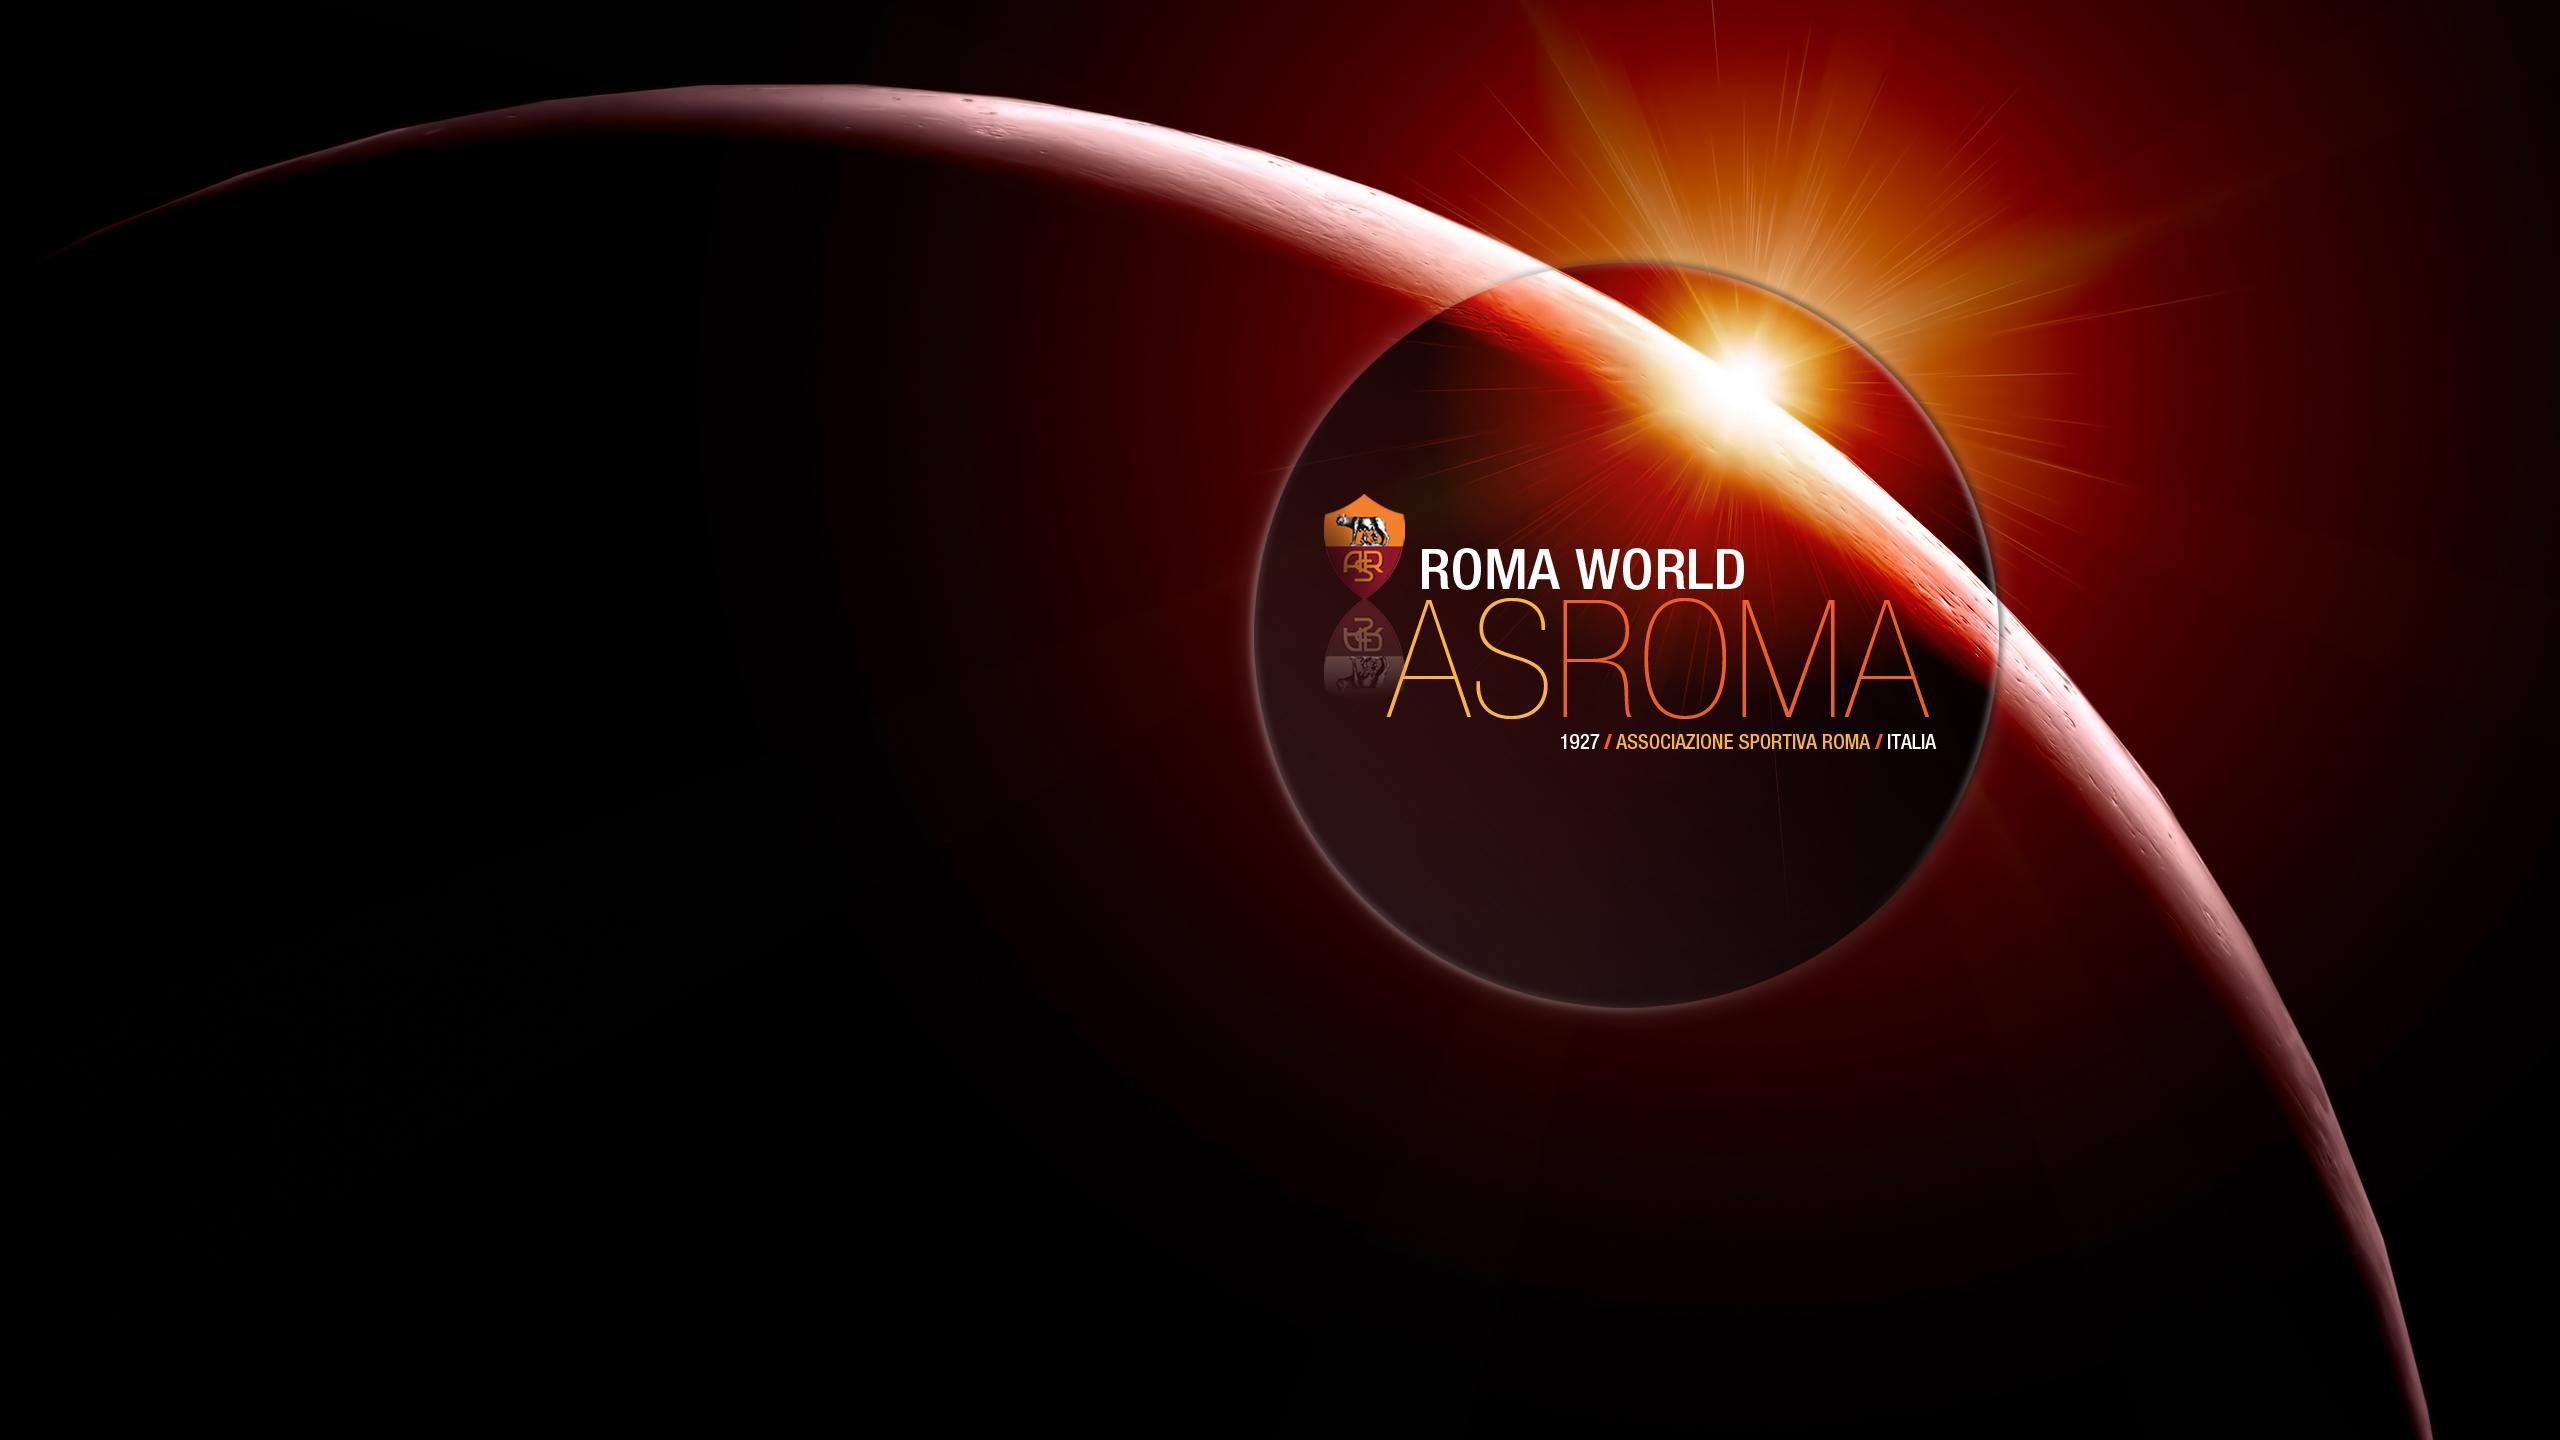 as-roma-logo-desktop-wallpaper.jpg